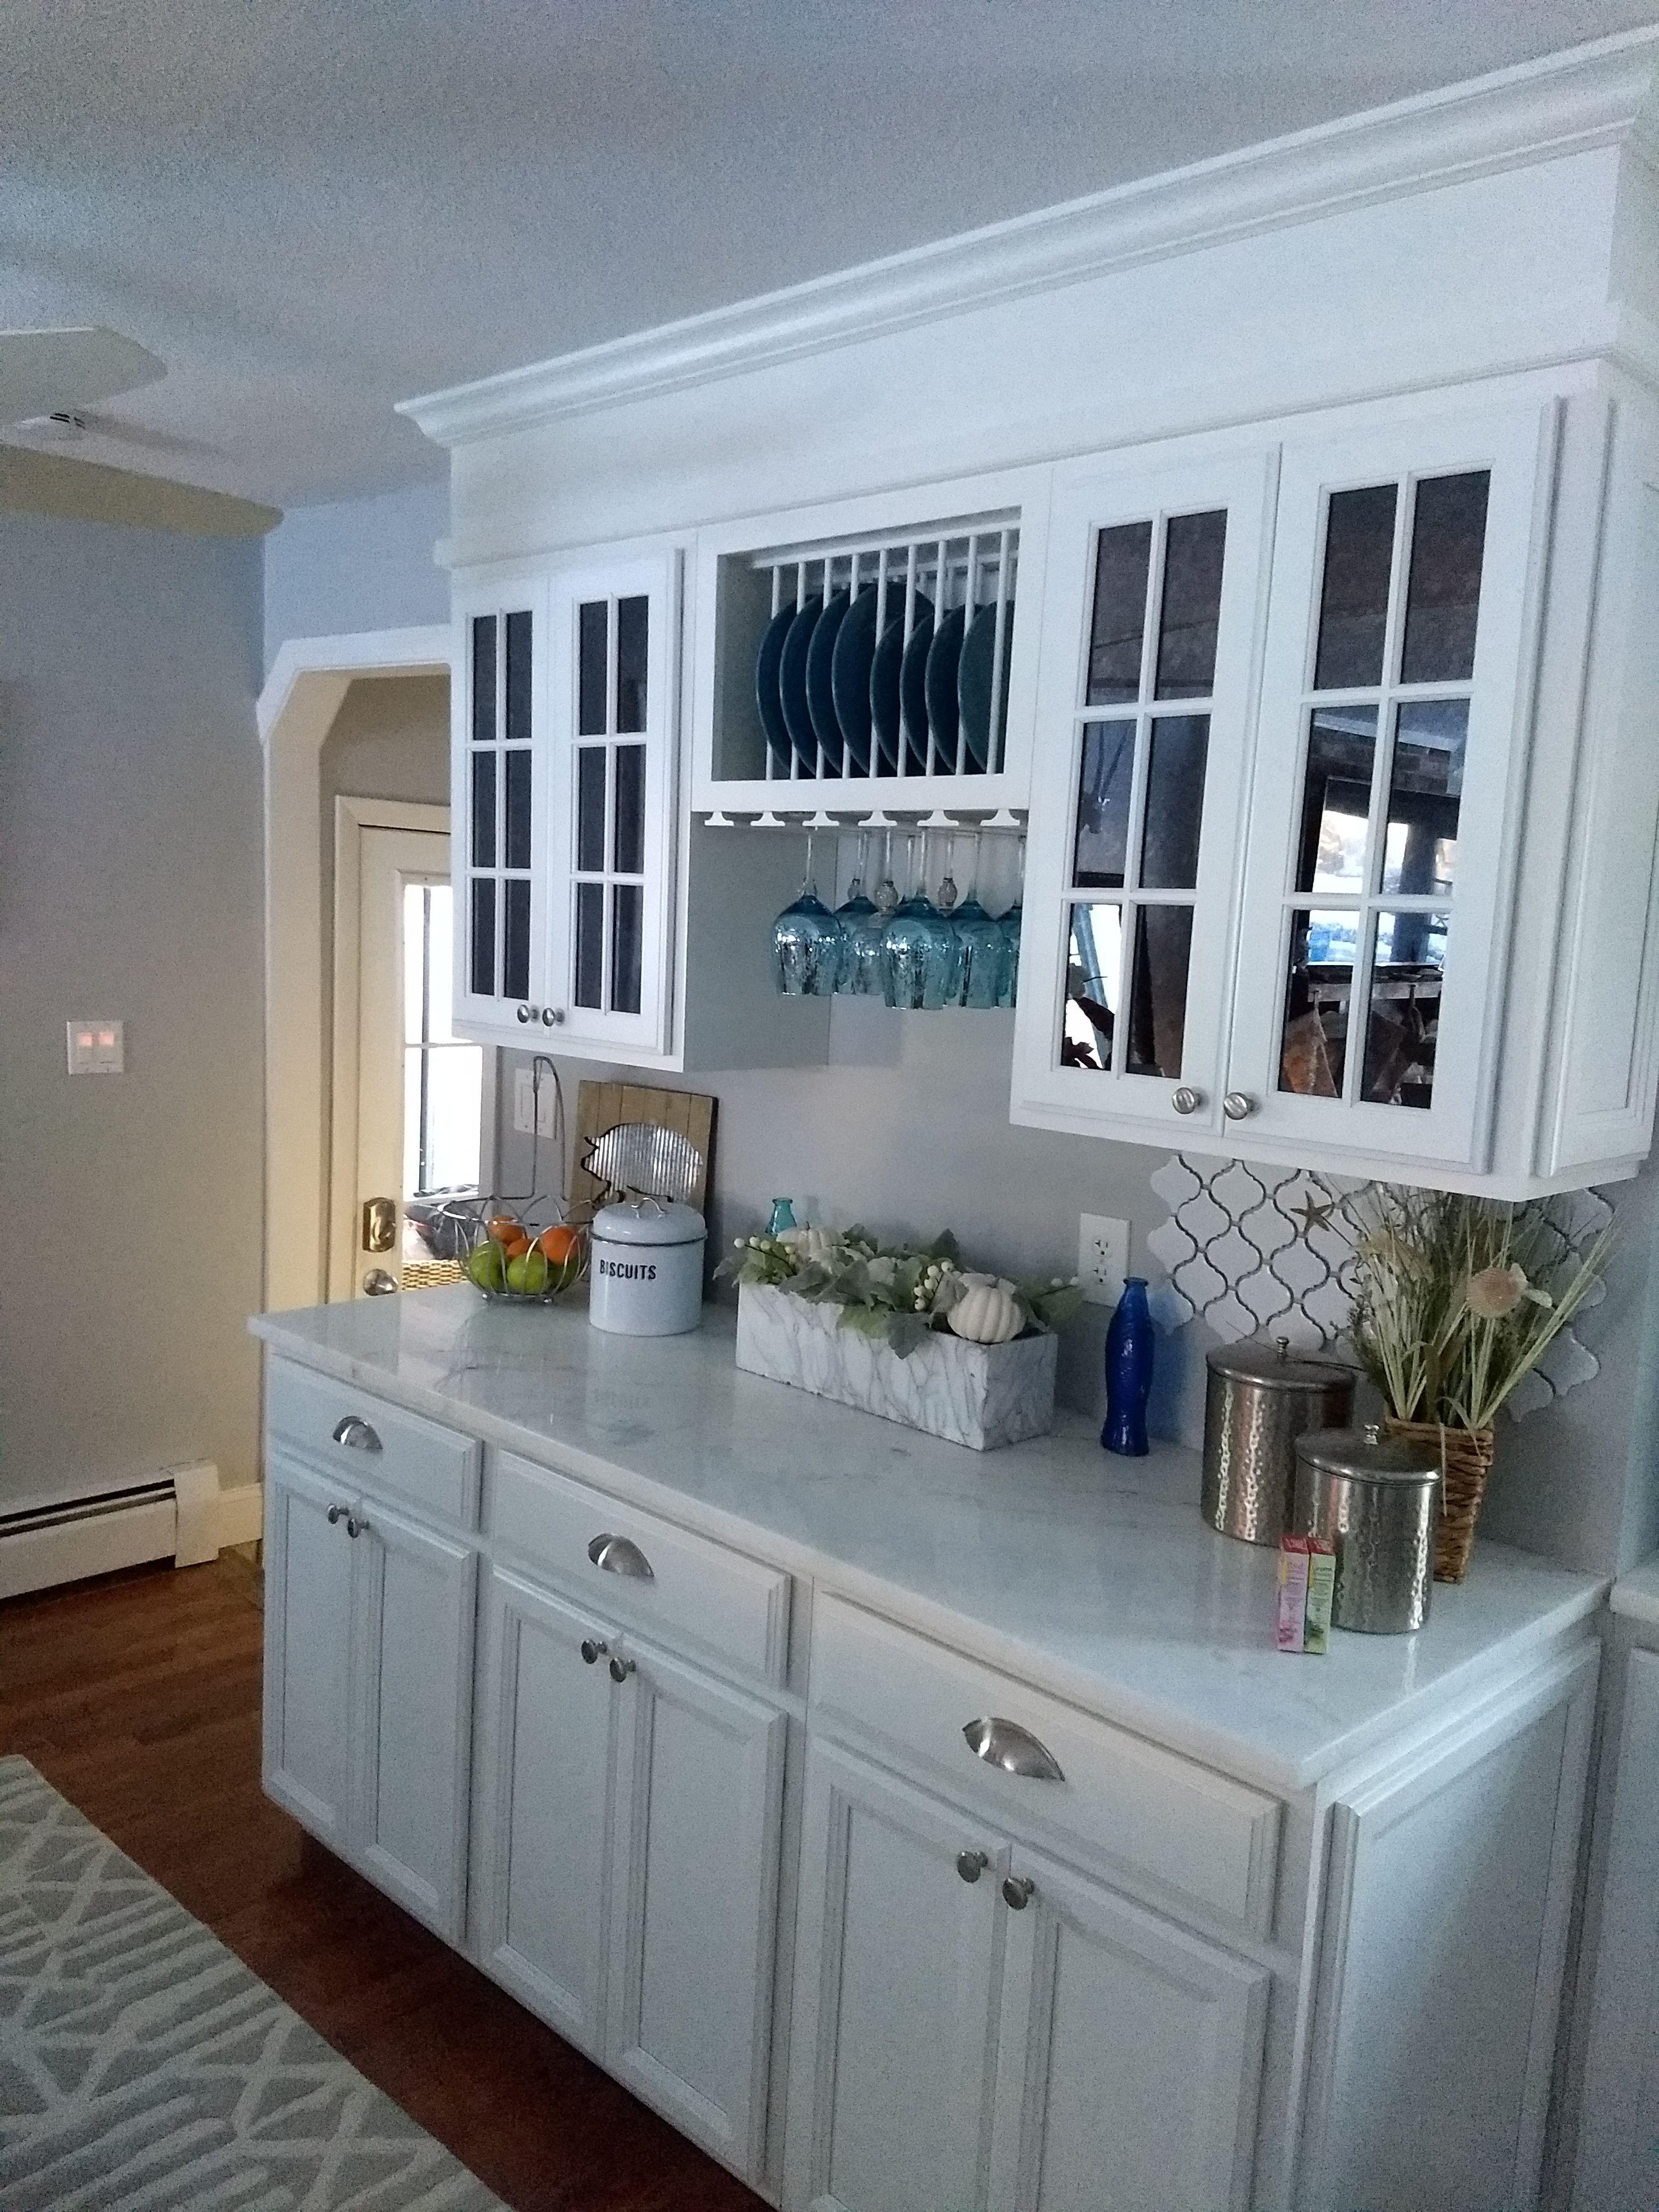 White on white - kitchen reno 1966 ranch! | Kitchen | Pinterest ...